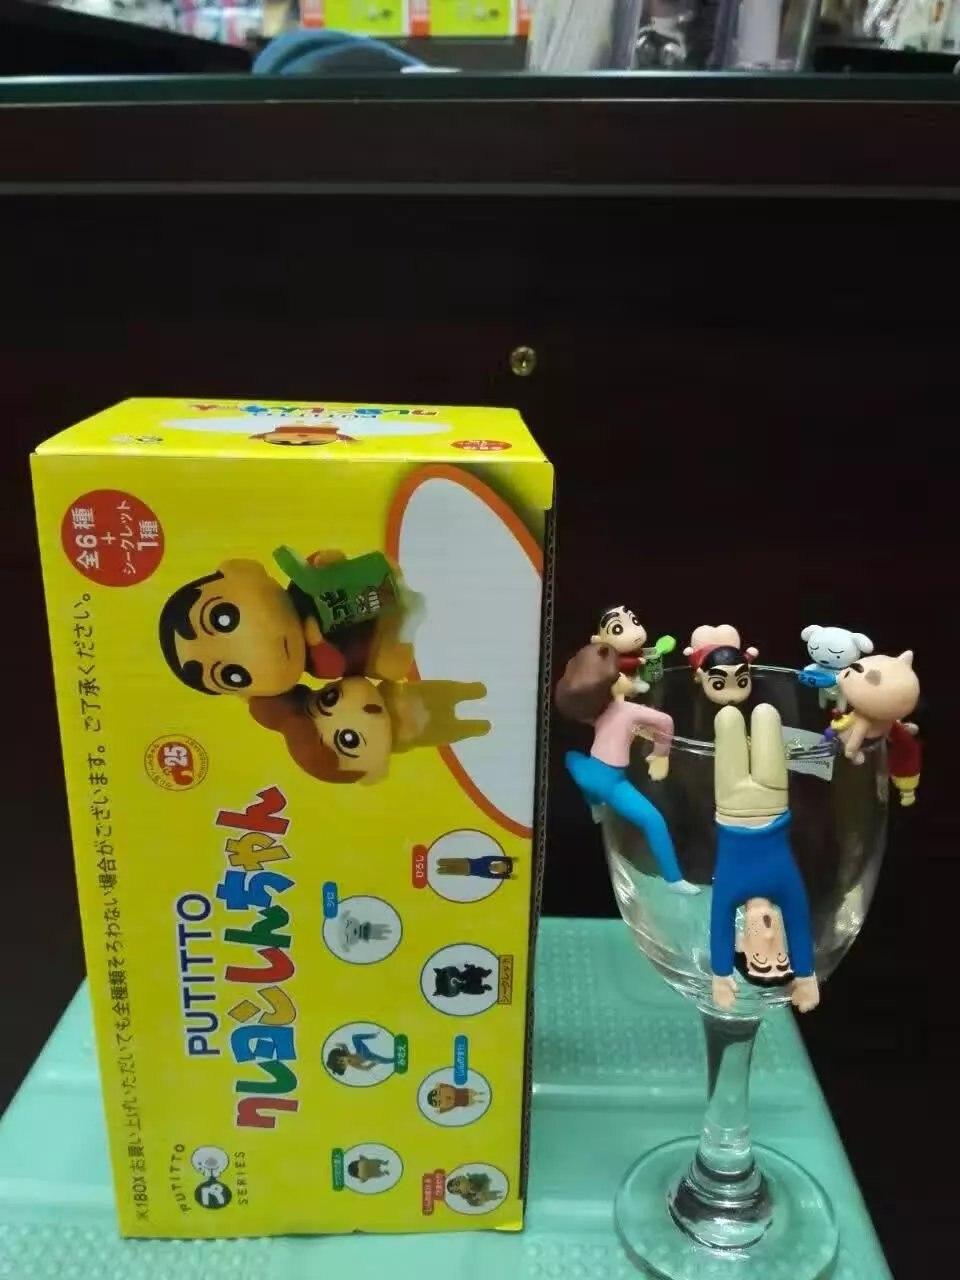 Kitan Club PUTITTO Crayon Shin chan mini tea cup friends figure toys gift box